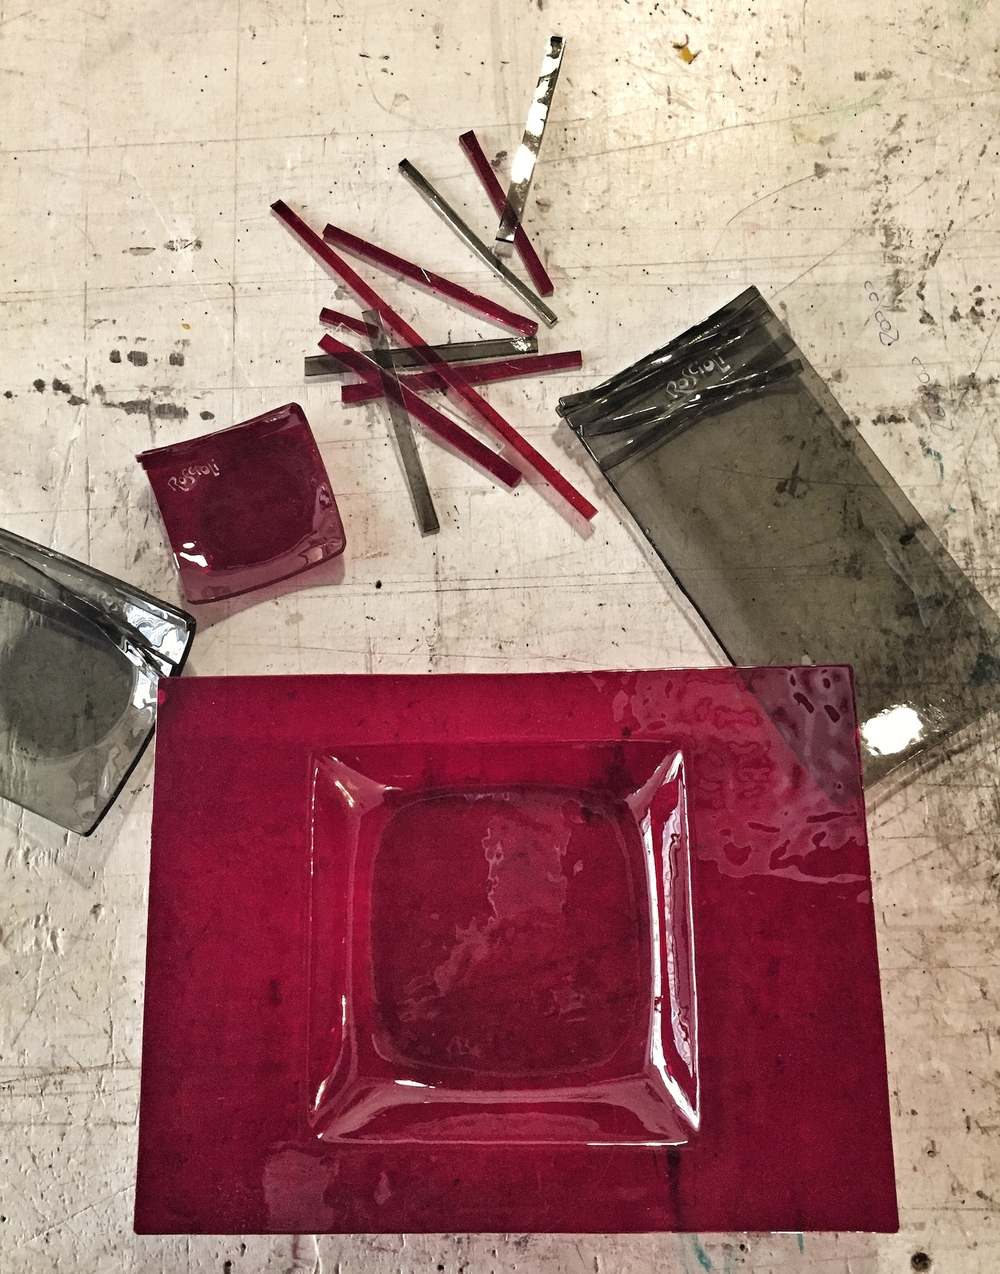 workingprogress-handmade-glass-tableware-roscioli-caffe.jpg